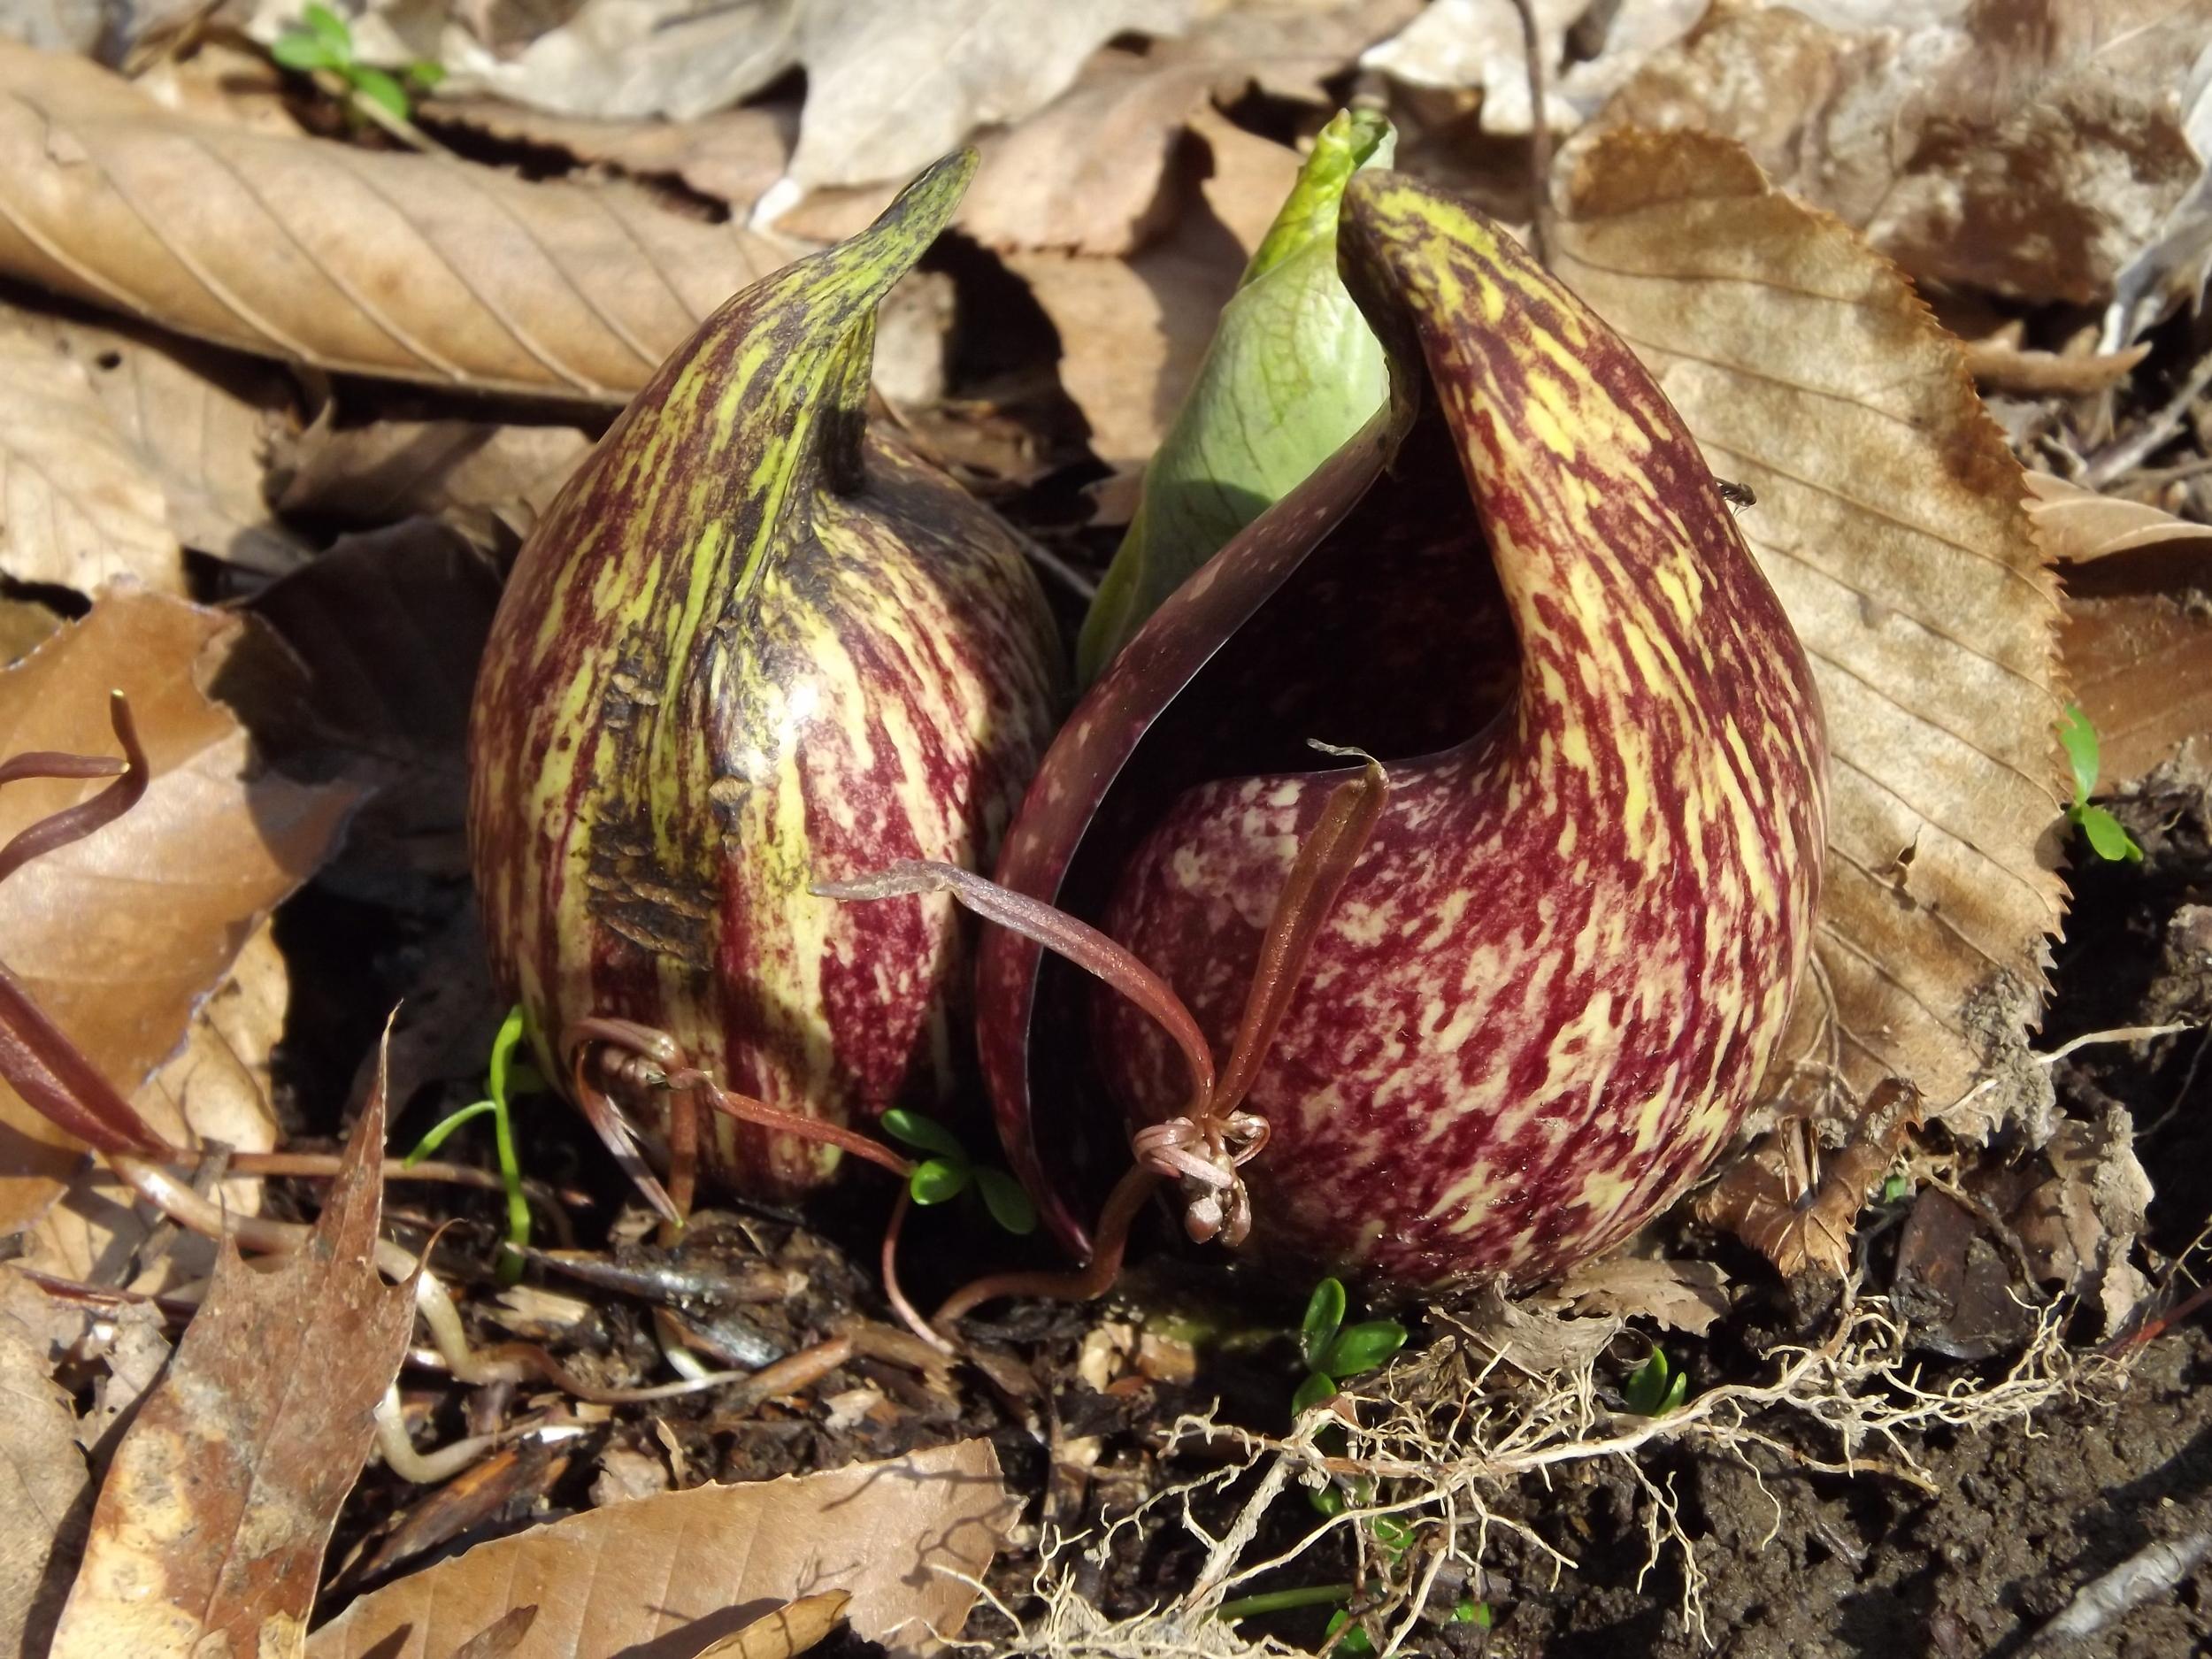 Eastern Skunk Cabbage   Symplocarpus foetidus   3.10.13